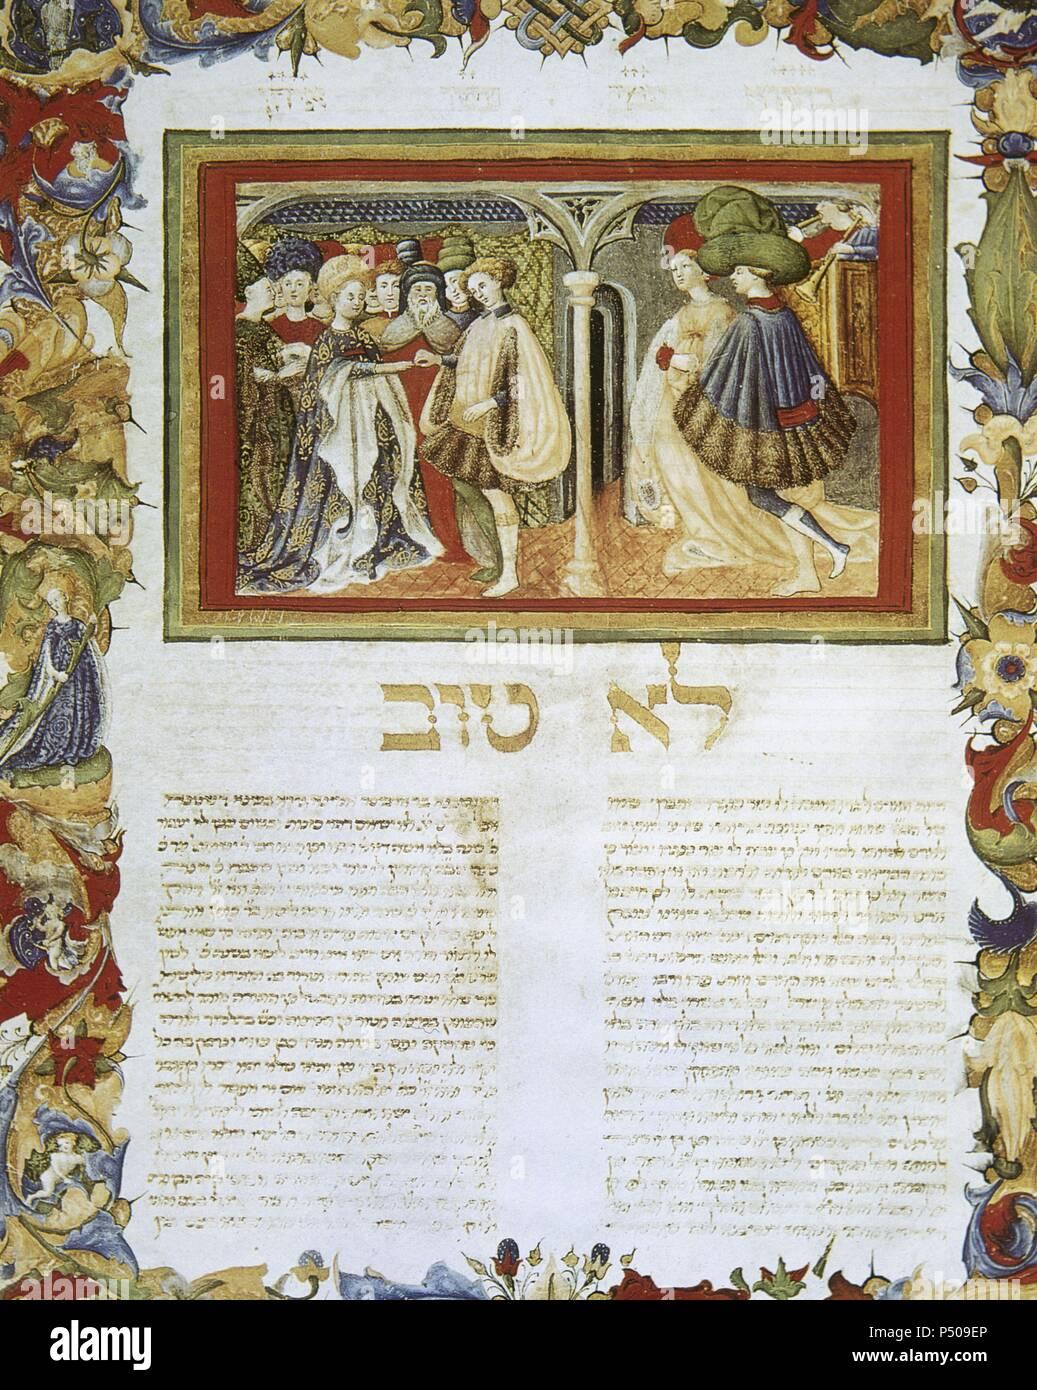 Arba'ah Turim or Tur. Halakhic code by Yaakov ben Asher (1270-1340). Hebrew. Miniature. Hebrew marriage scene. 1436. Folio 220v. Vatican Apostolic Library. Stock Photo